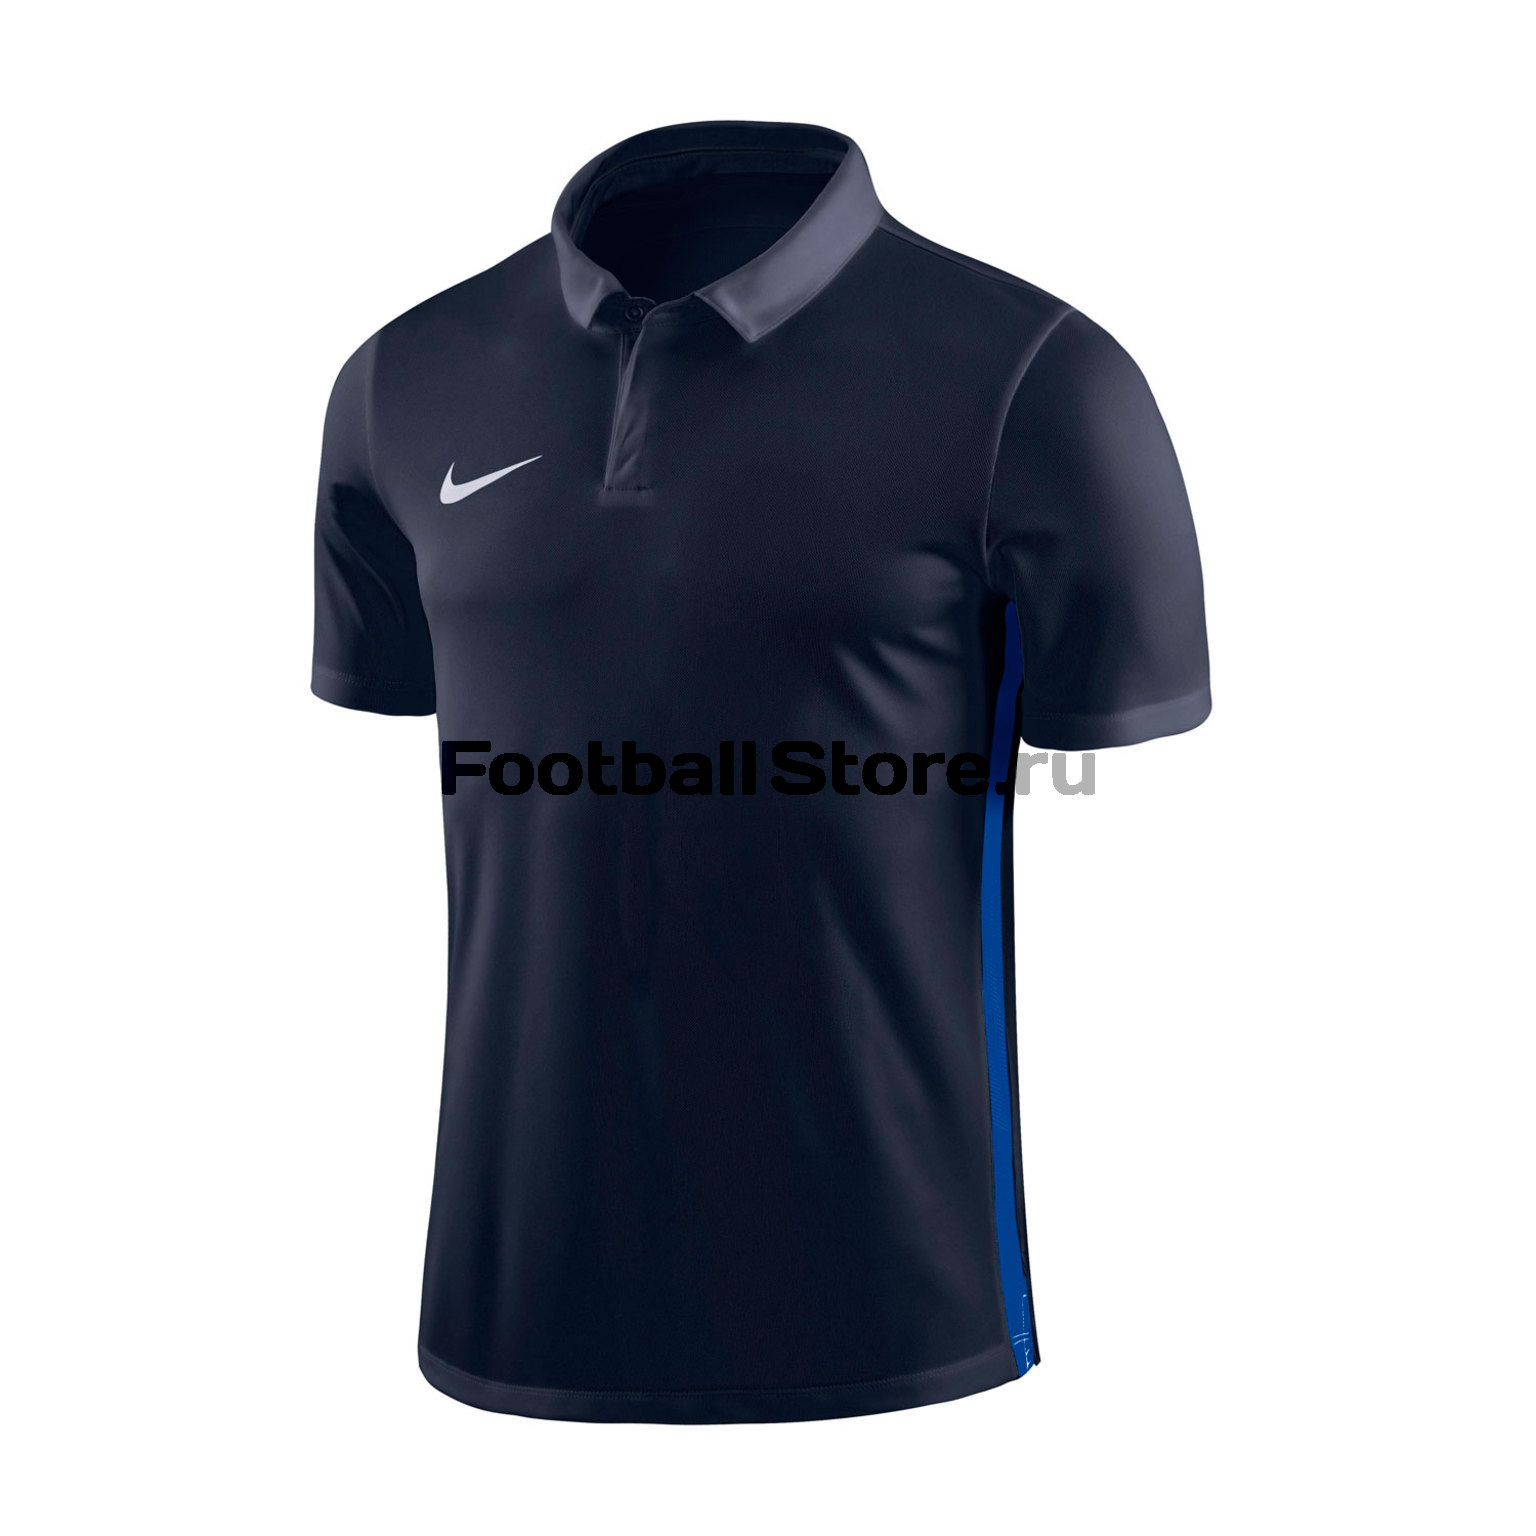 Поло подростковое Nike Dry Academy Polo 899991-451 цена в Москве и Питере